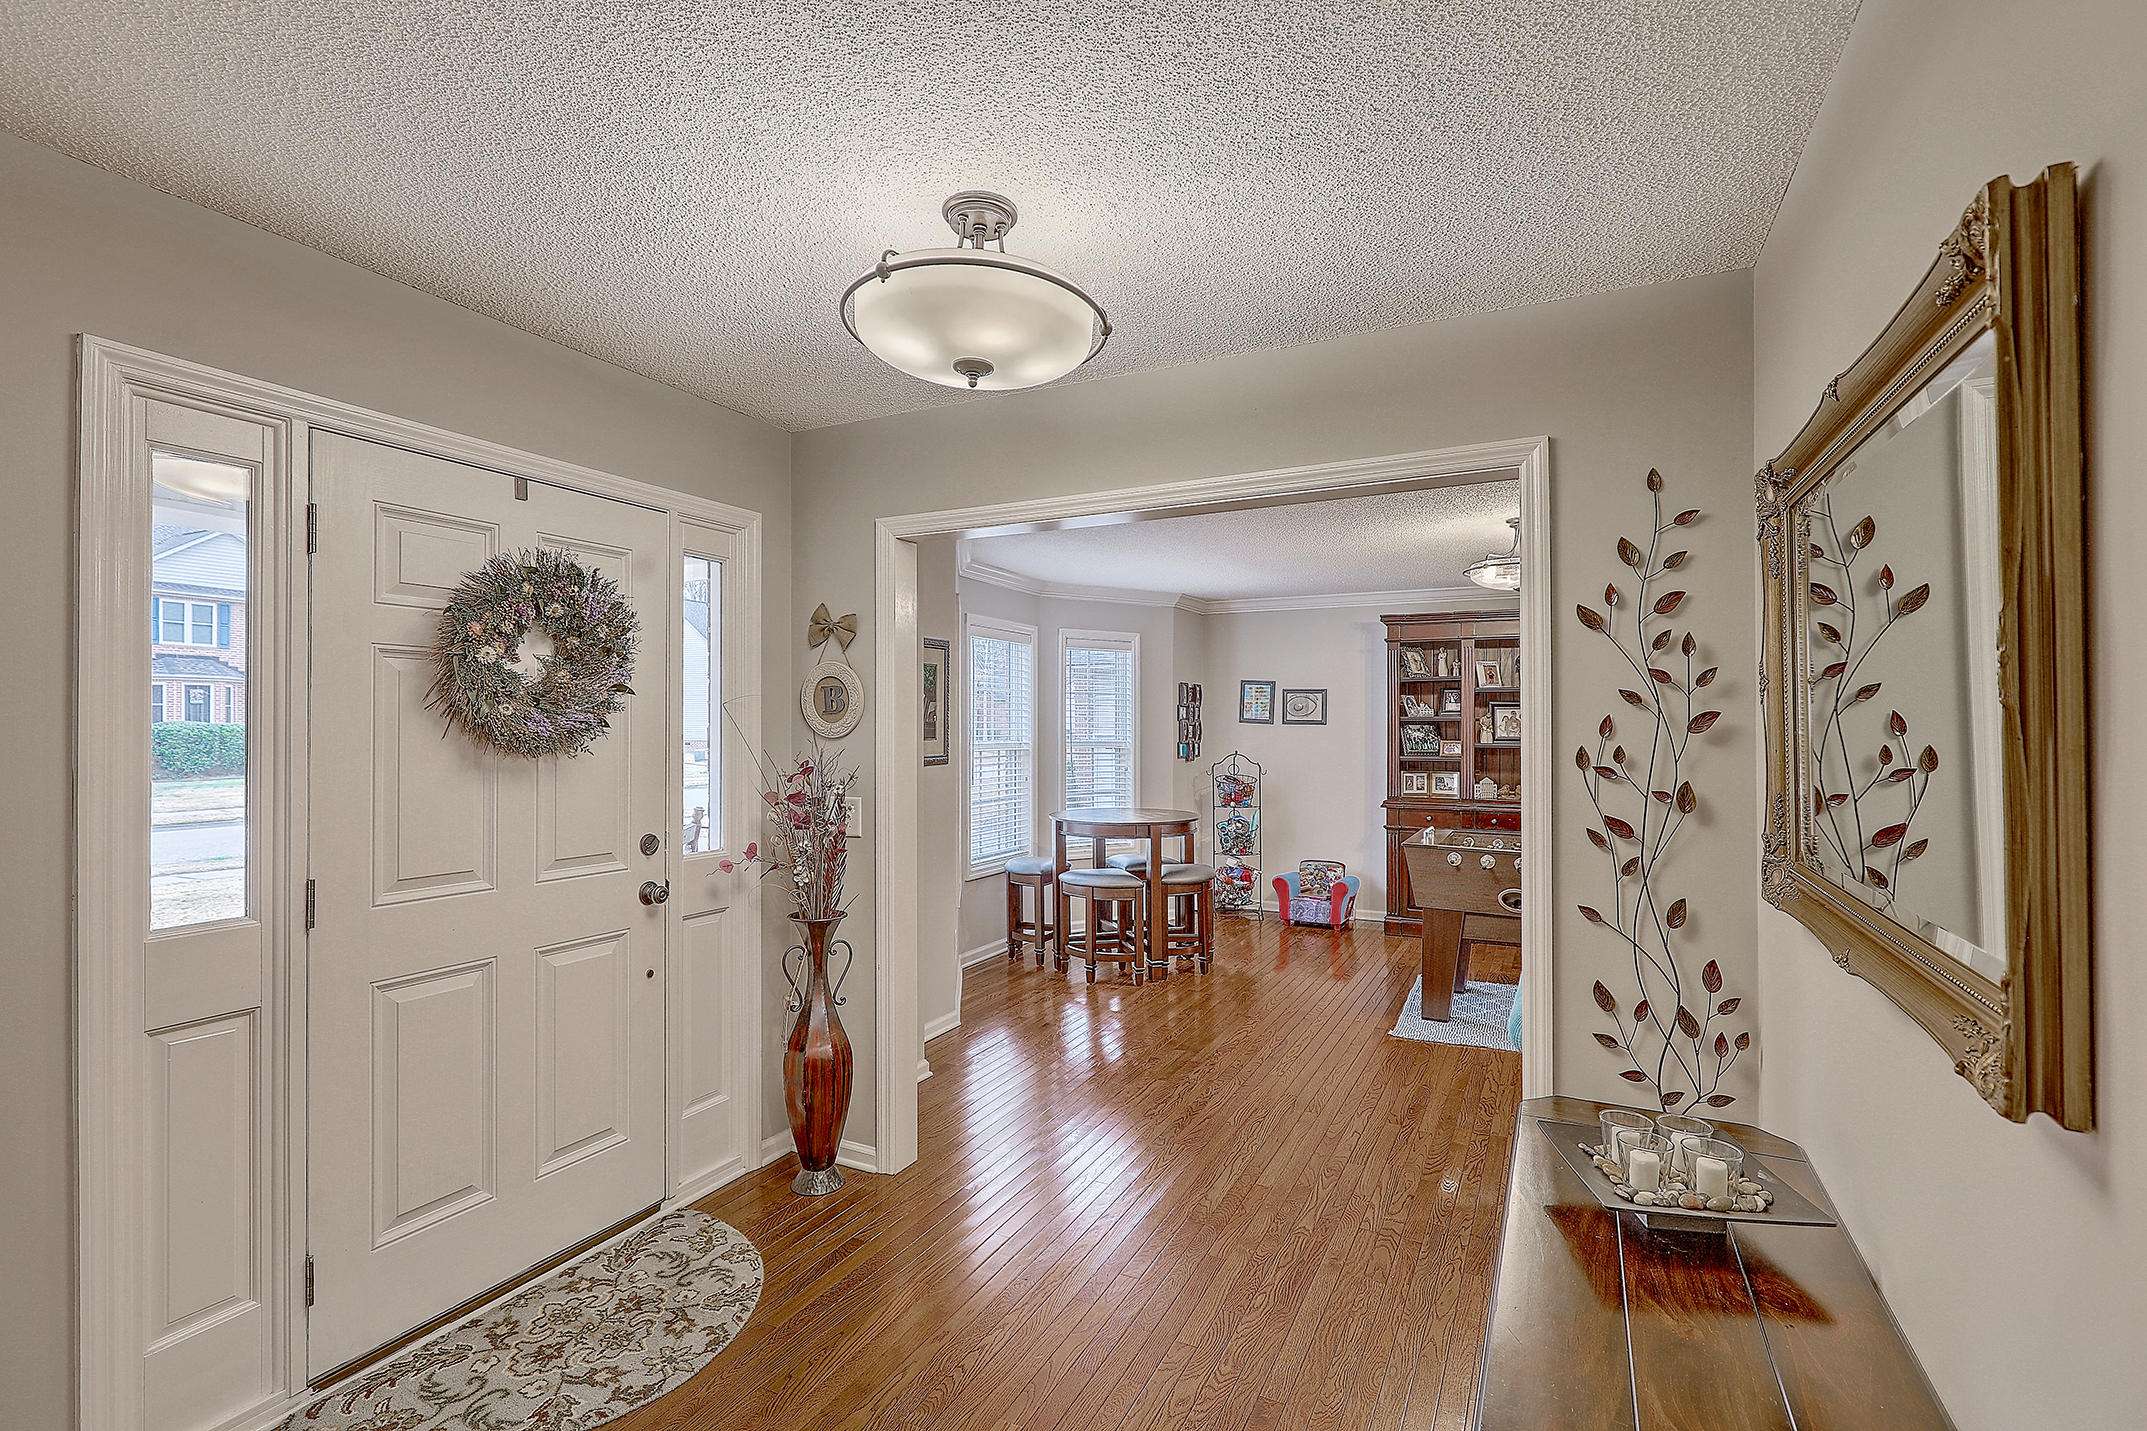 Crowfield Plantation Homes For Sale - 104 Jamesford, Goose Creek, SC - 16